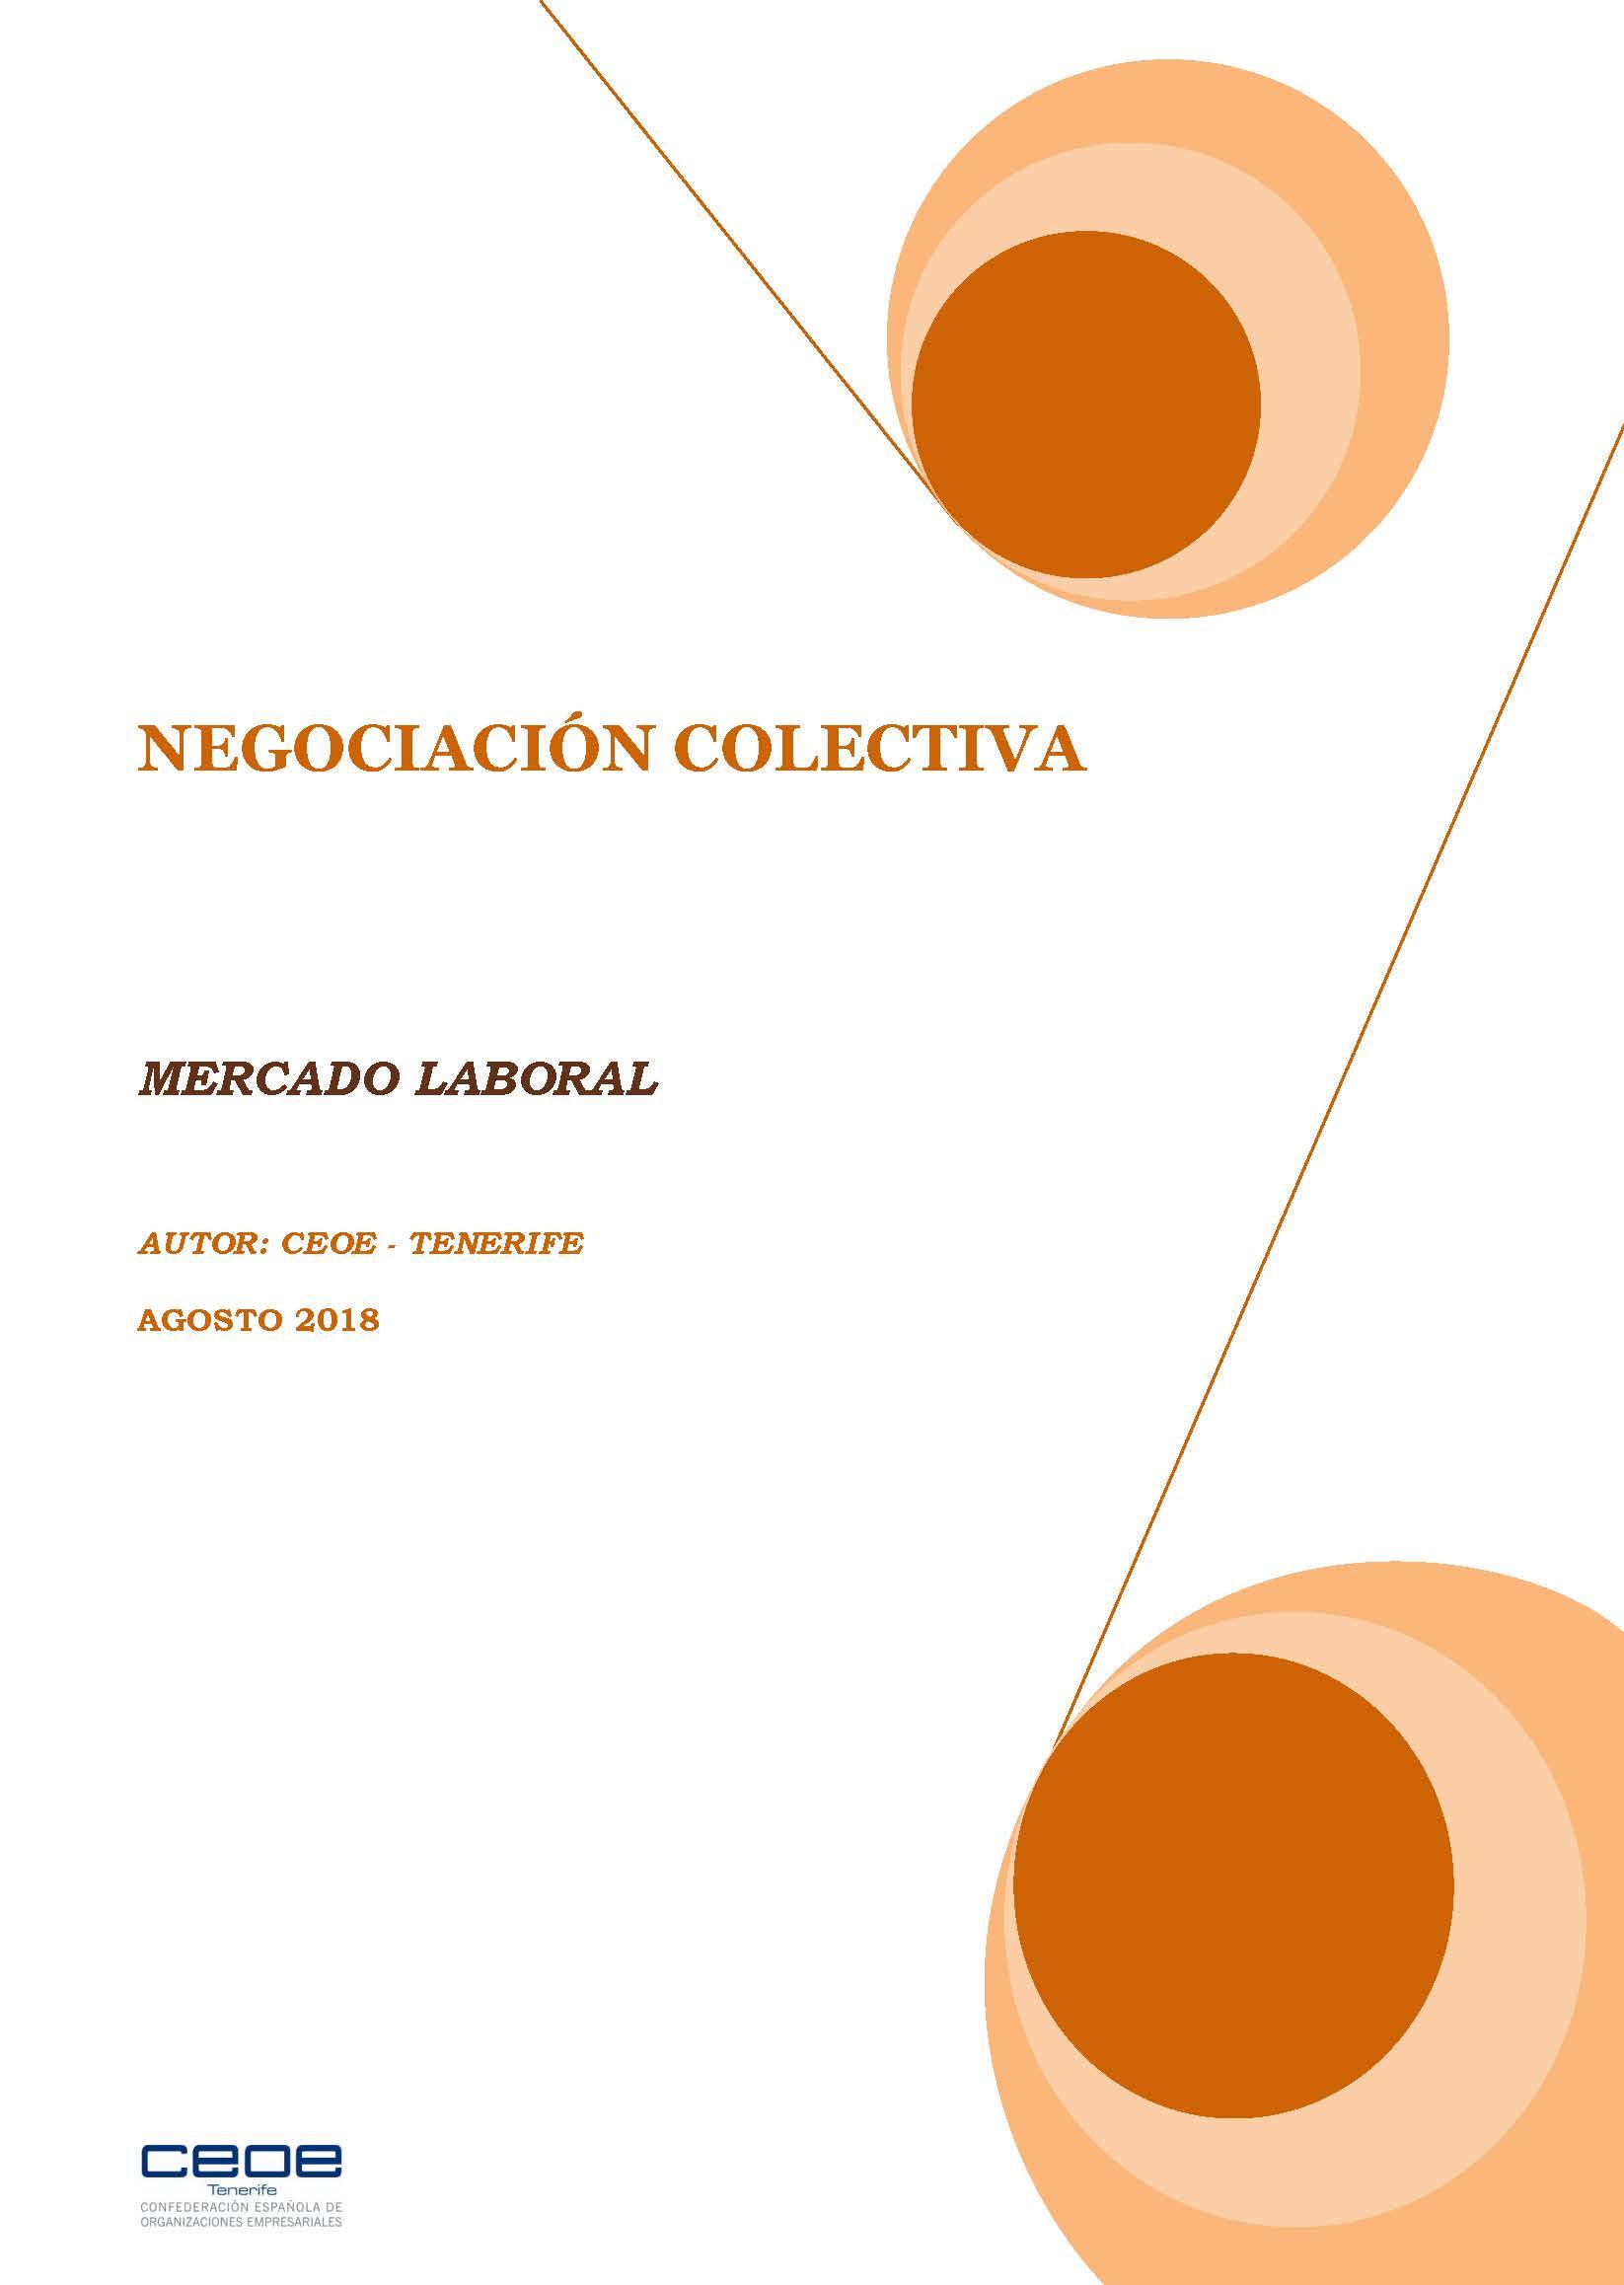 MERCADO LABORAL - NEGOCIACION COLECTIVA AGOSTO 2018